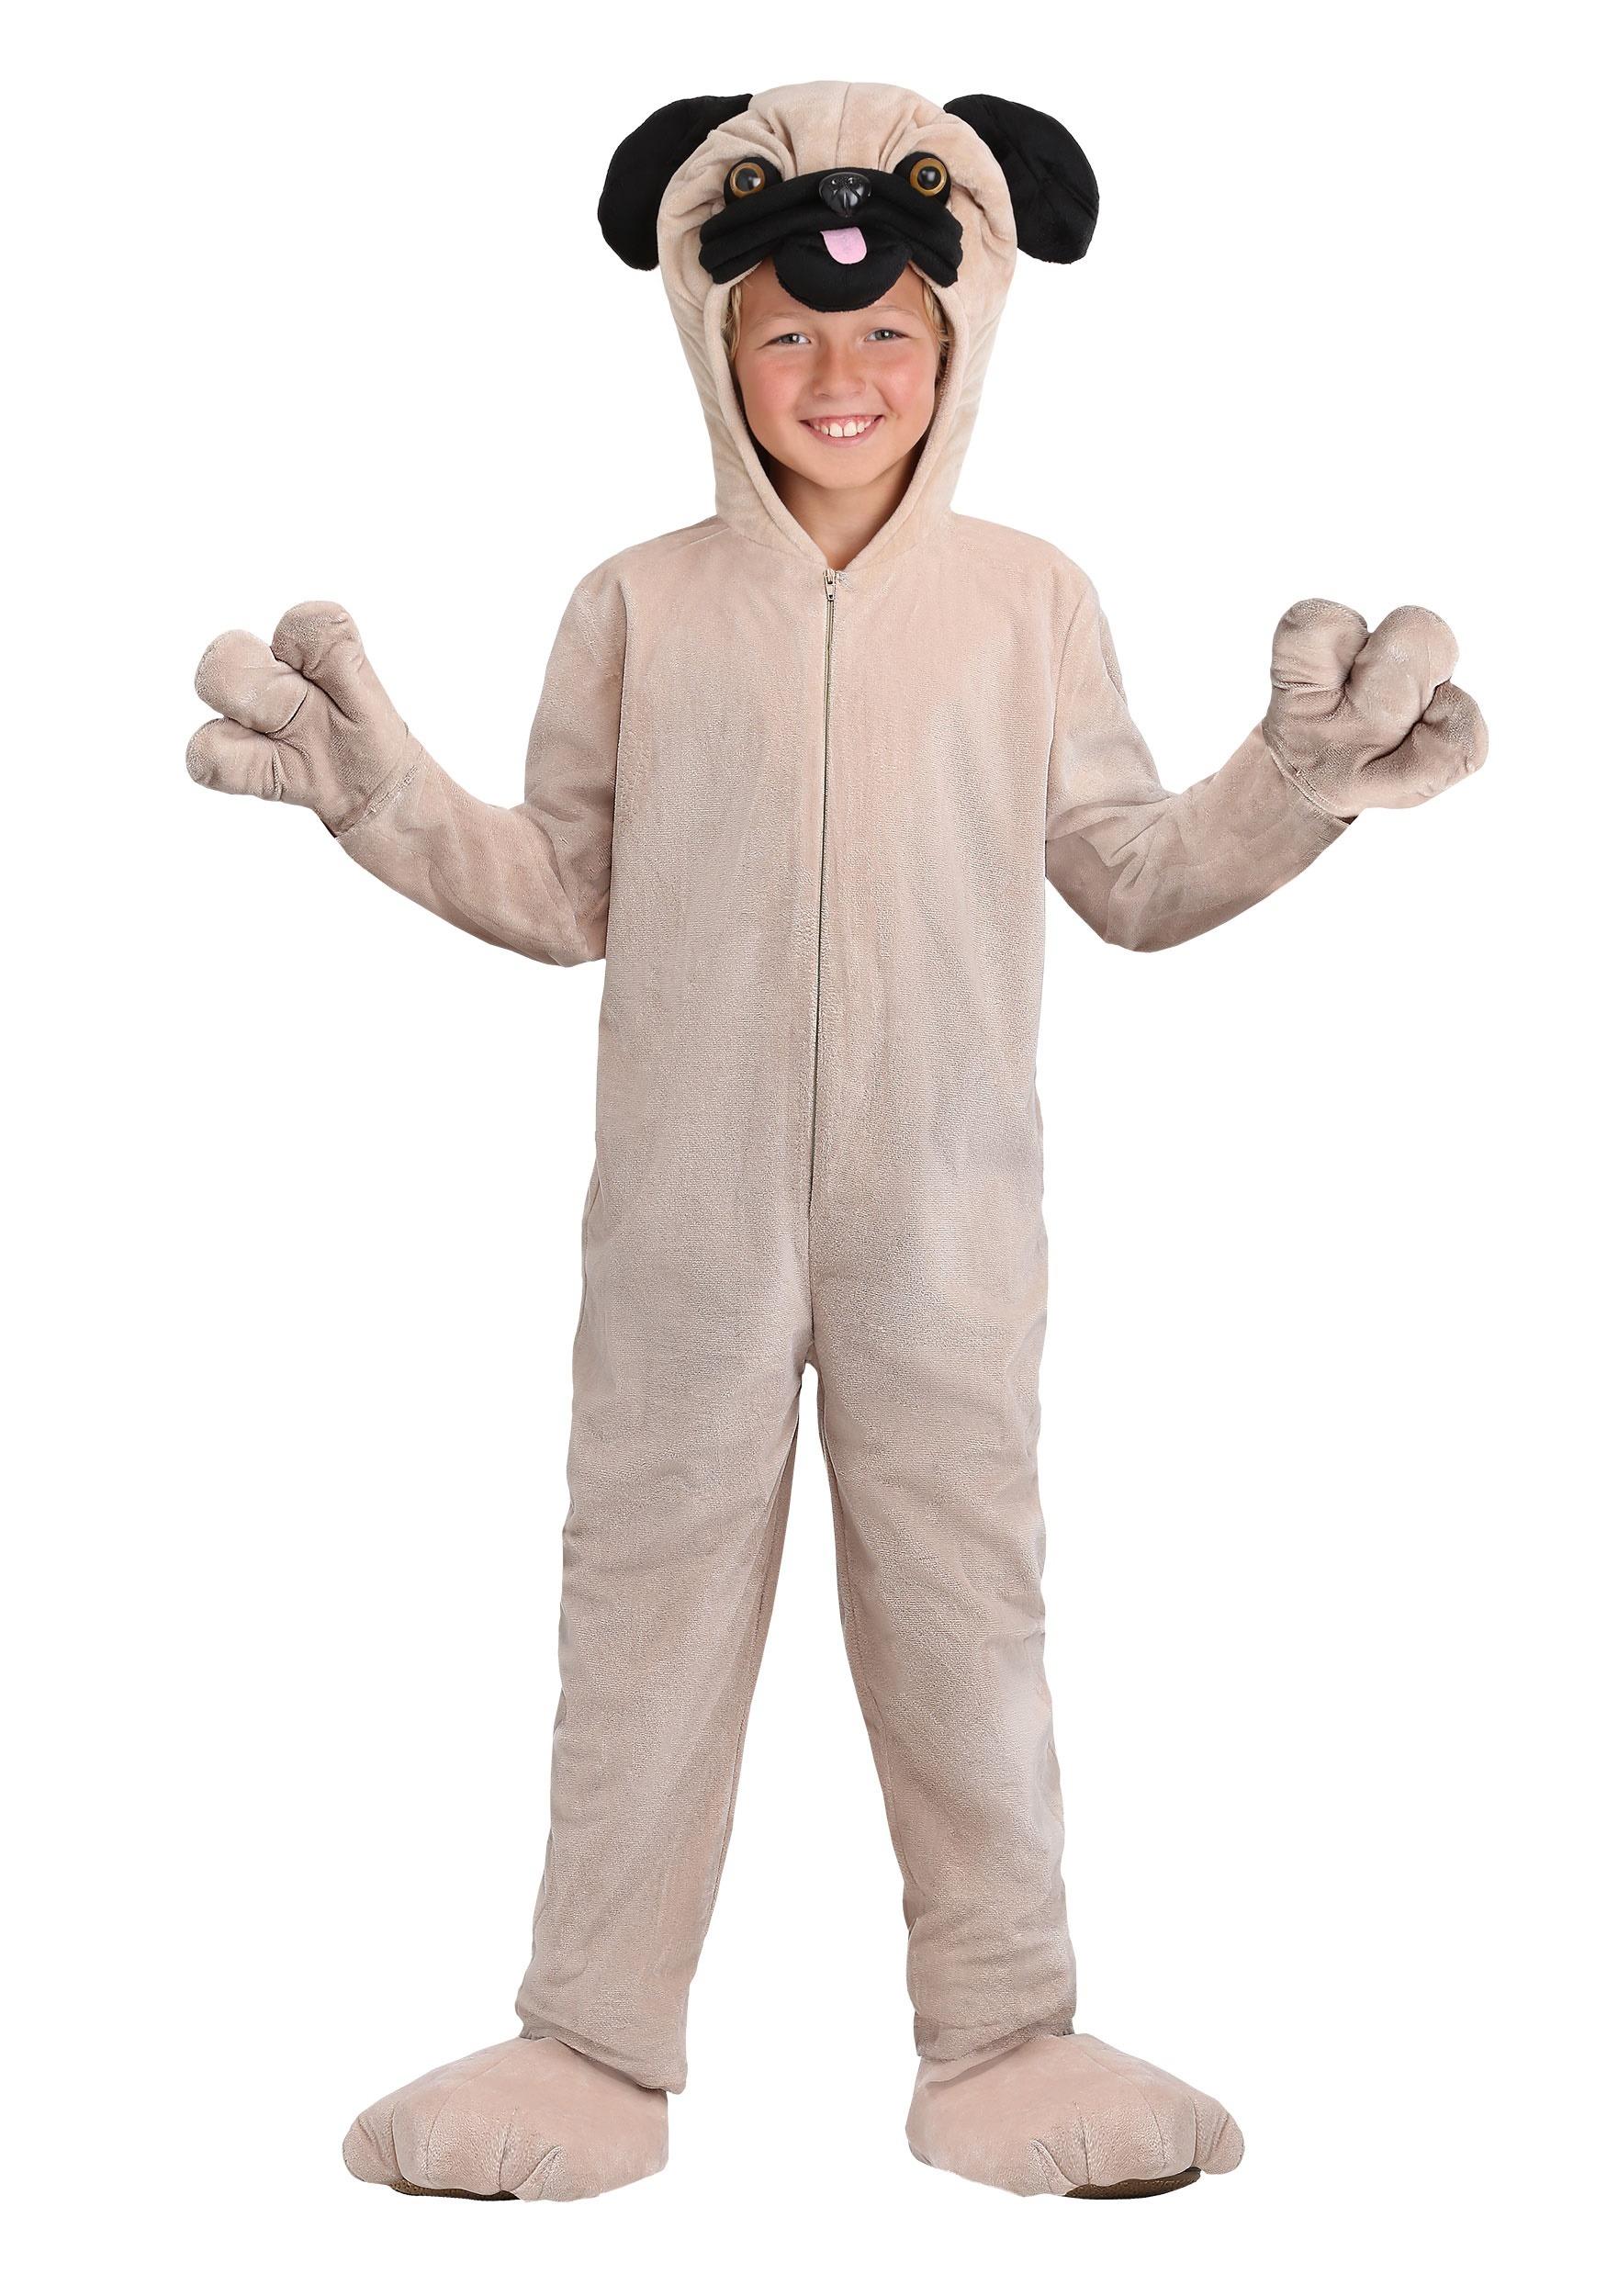 Pug Costume for Kids